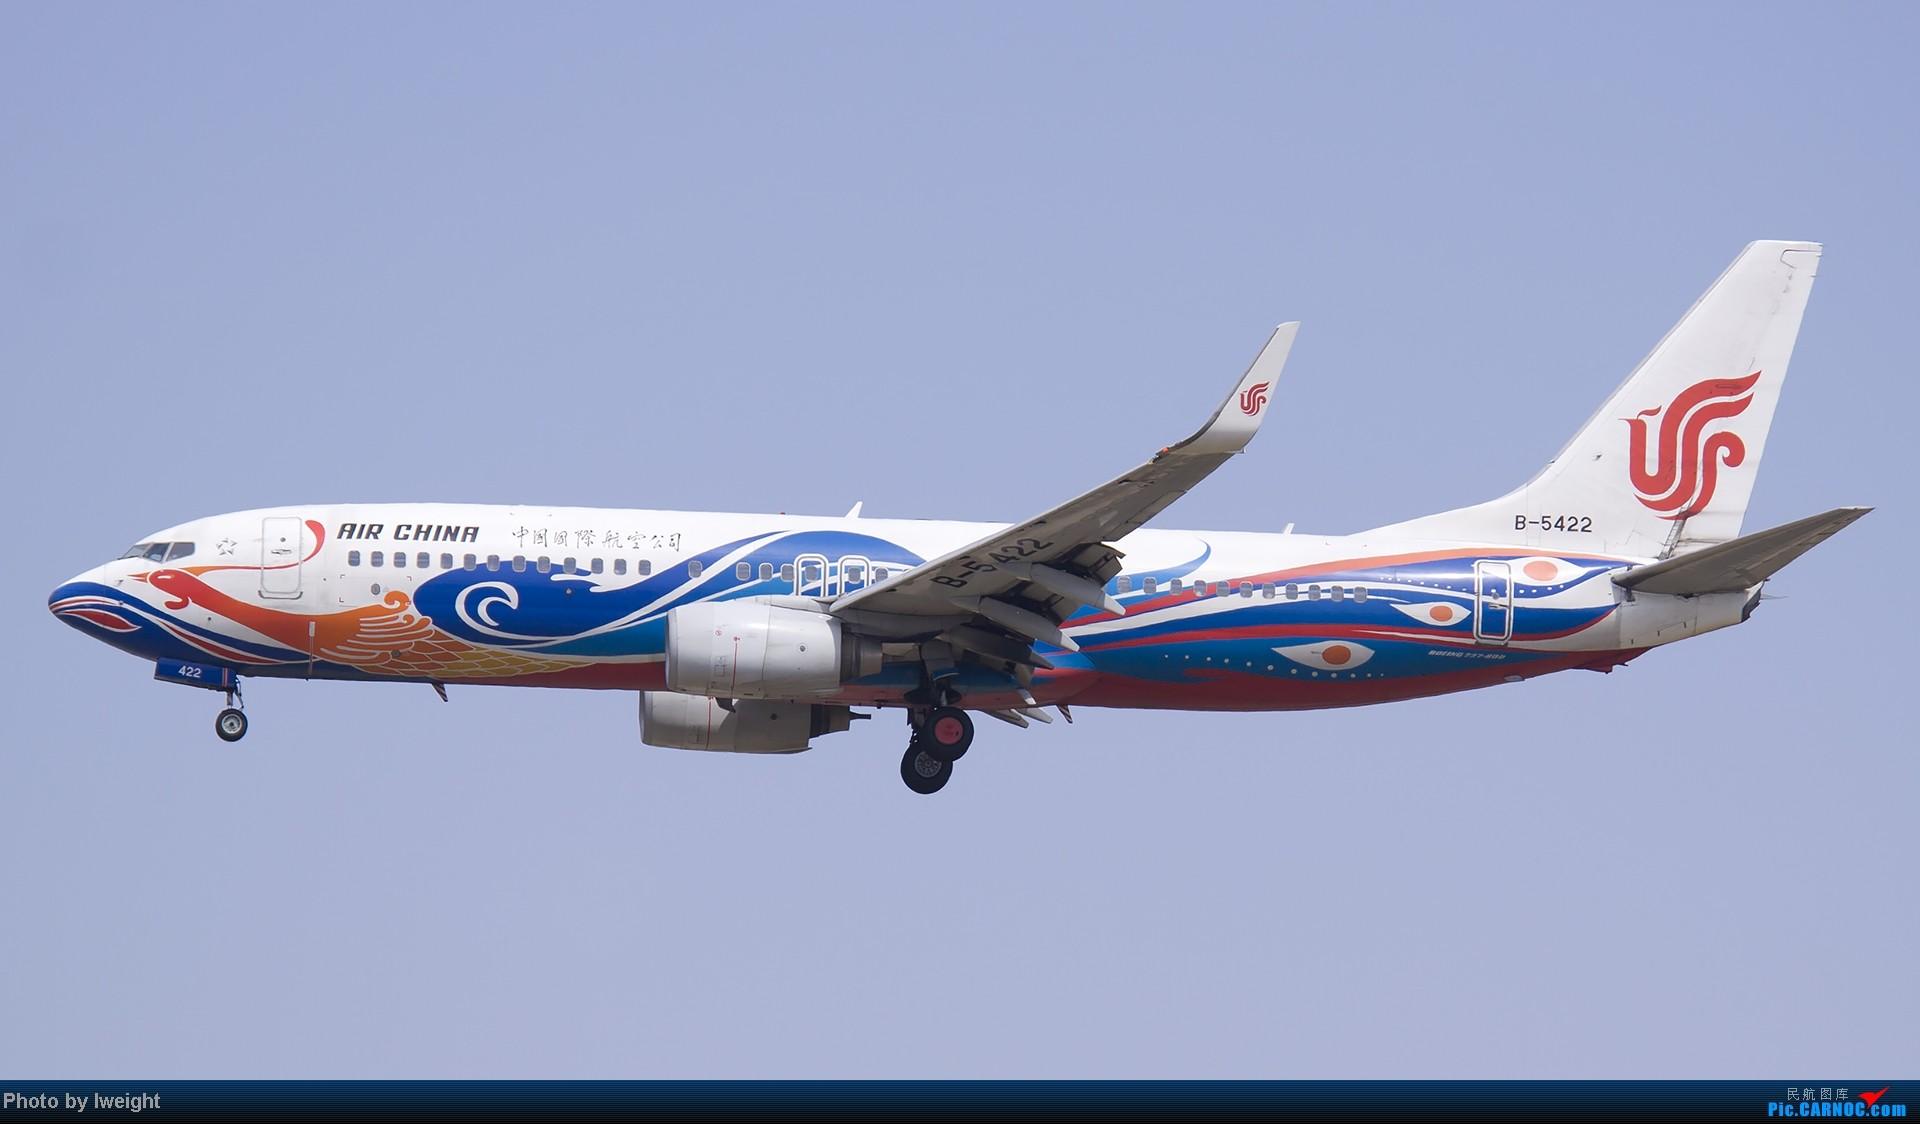 Re:[原创]北京难得的好天气,收获多种机型和彩绘,遗憾的是再次错过卡航巴塞罗那彩绘 BOEING 737-800 B-5422 中国北京首都机场